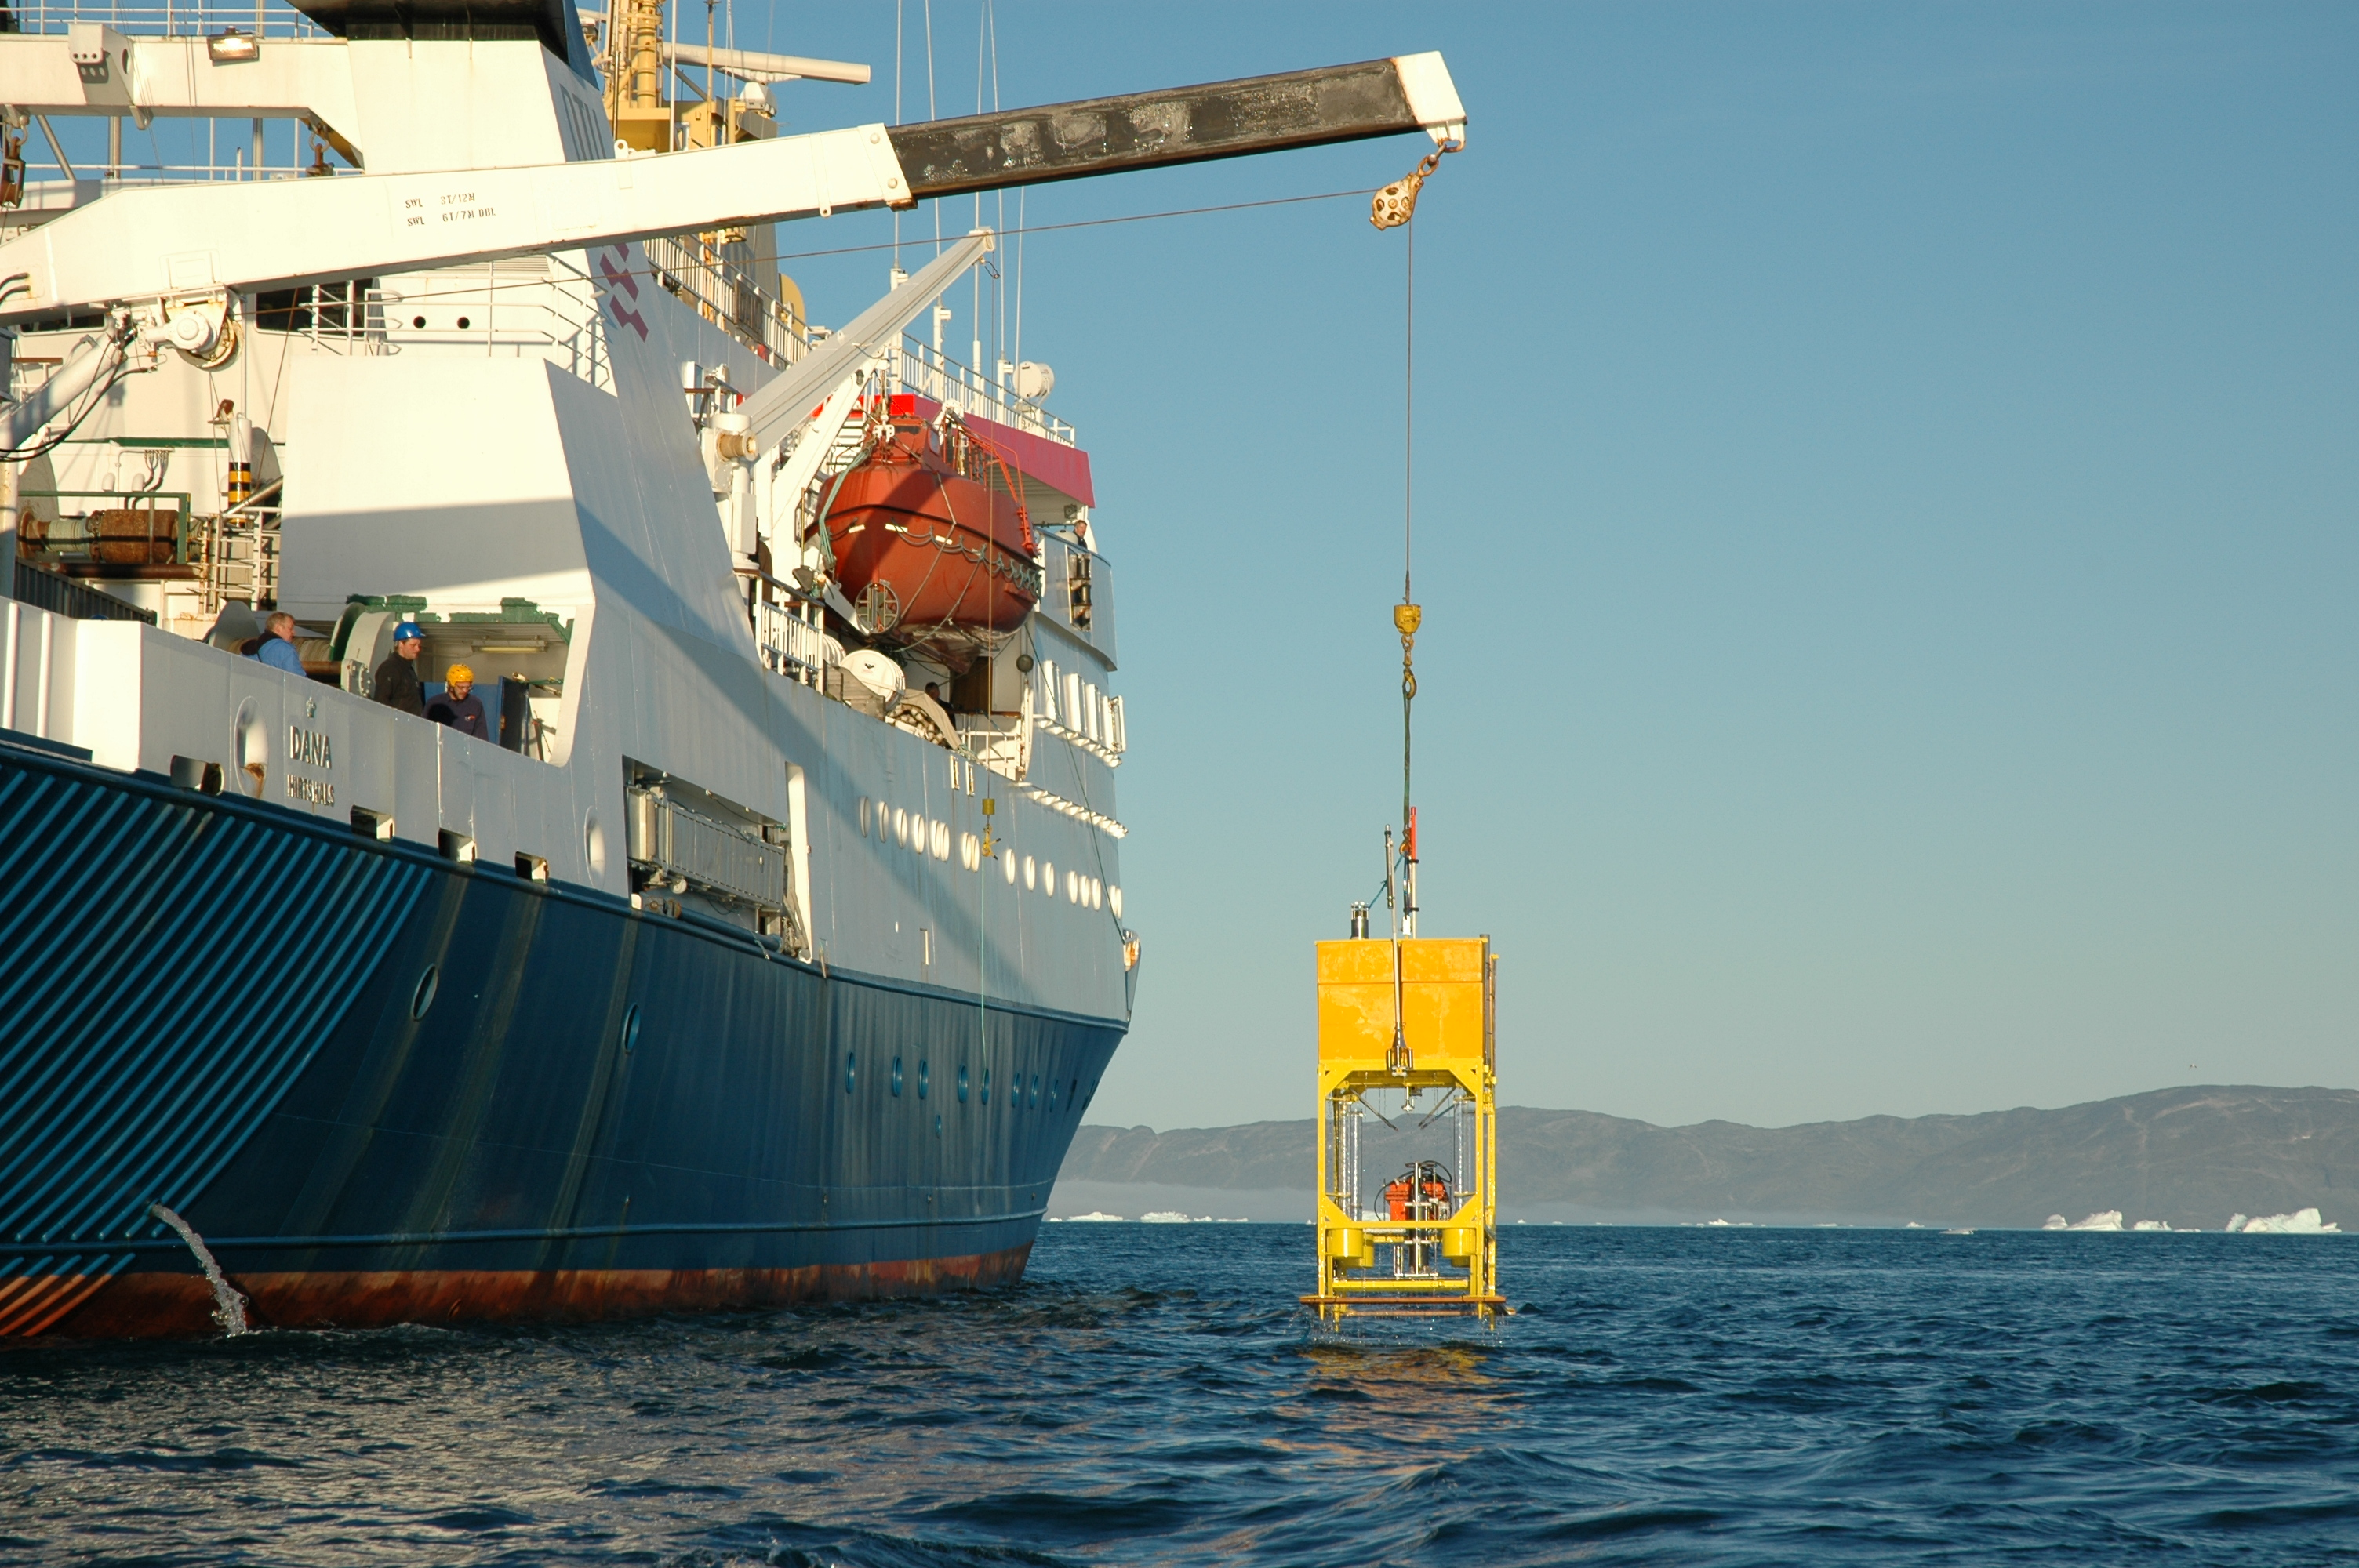 Prototype på autonom ubåd hales op efter tidligere testdyk. (Foto: Glud & Rysgaard)